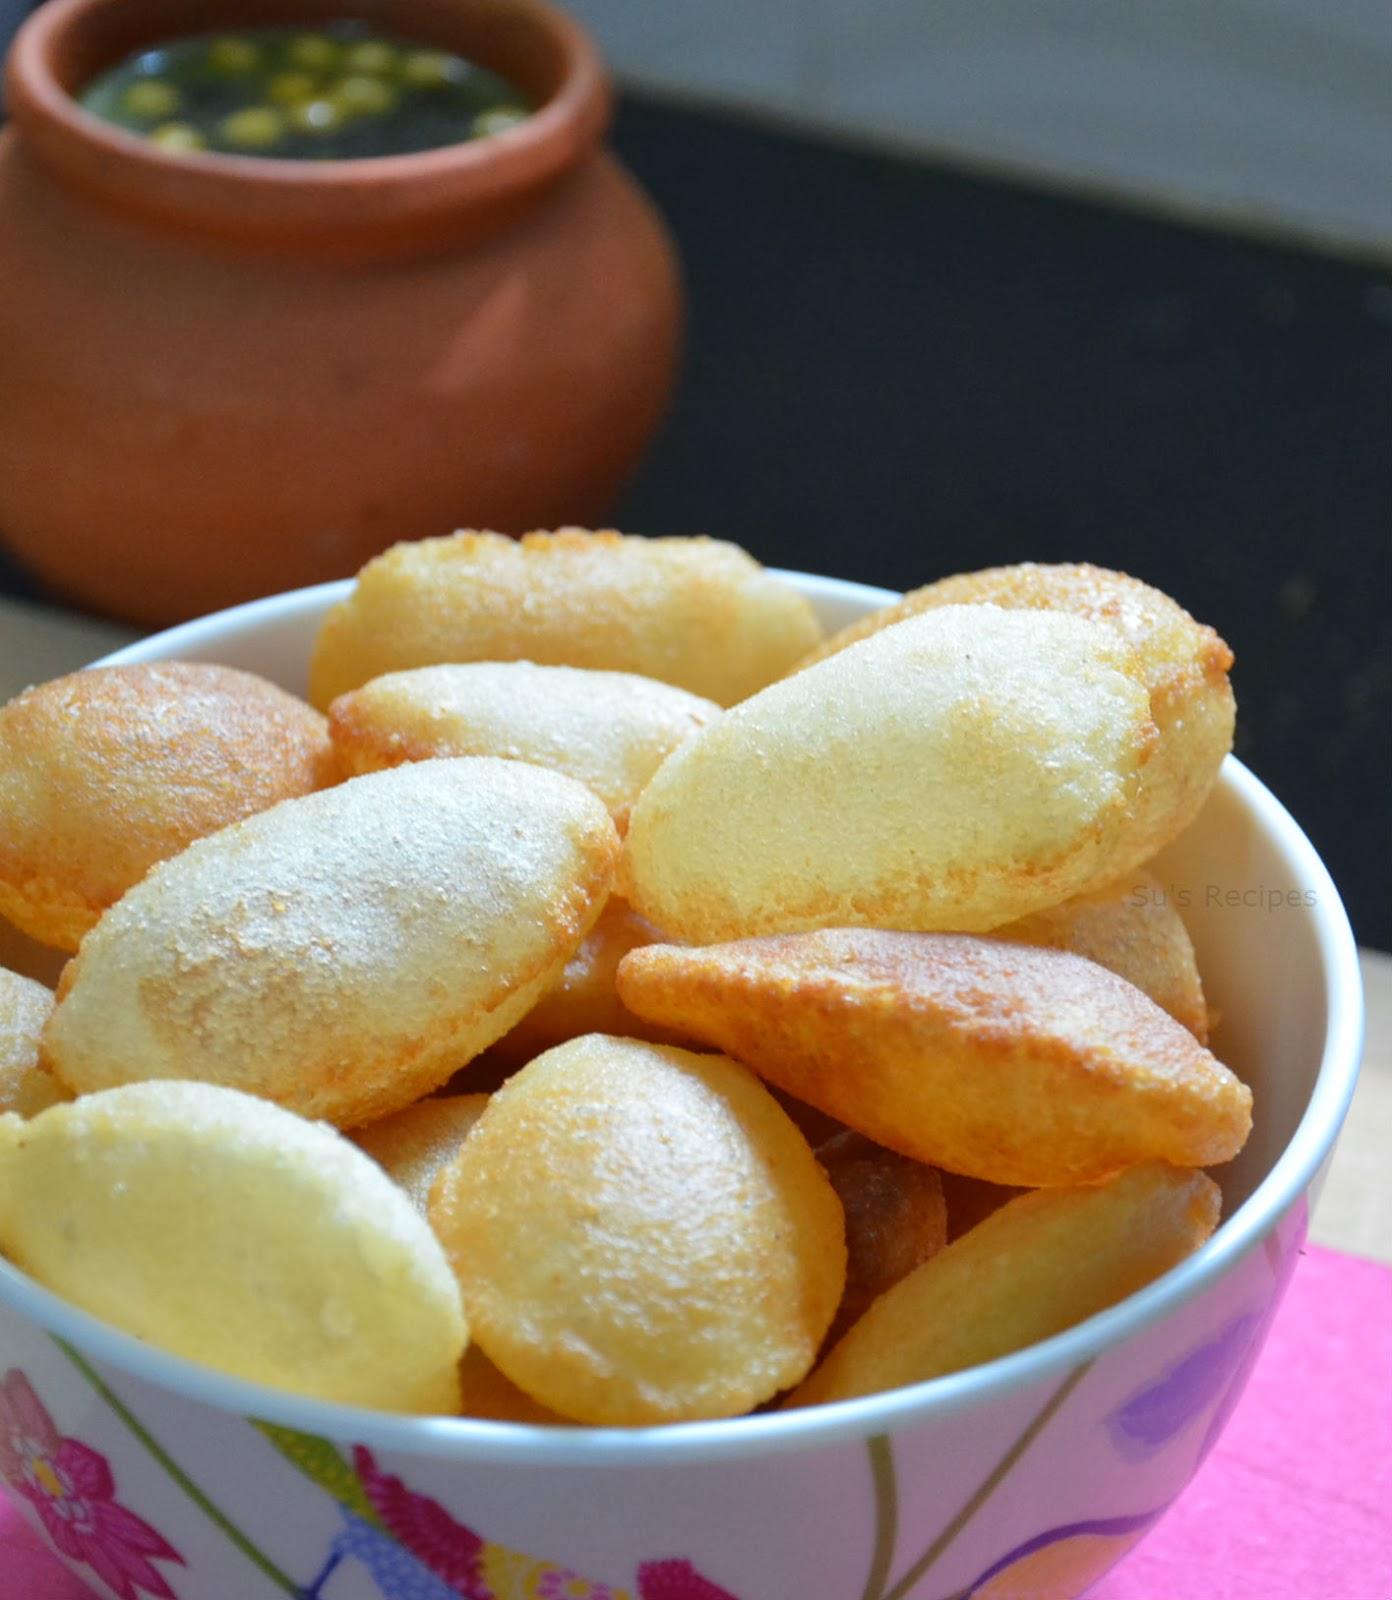 puri for pani puri, how to make puri for pani puri, golgappa, golgappa receipe, small puris